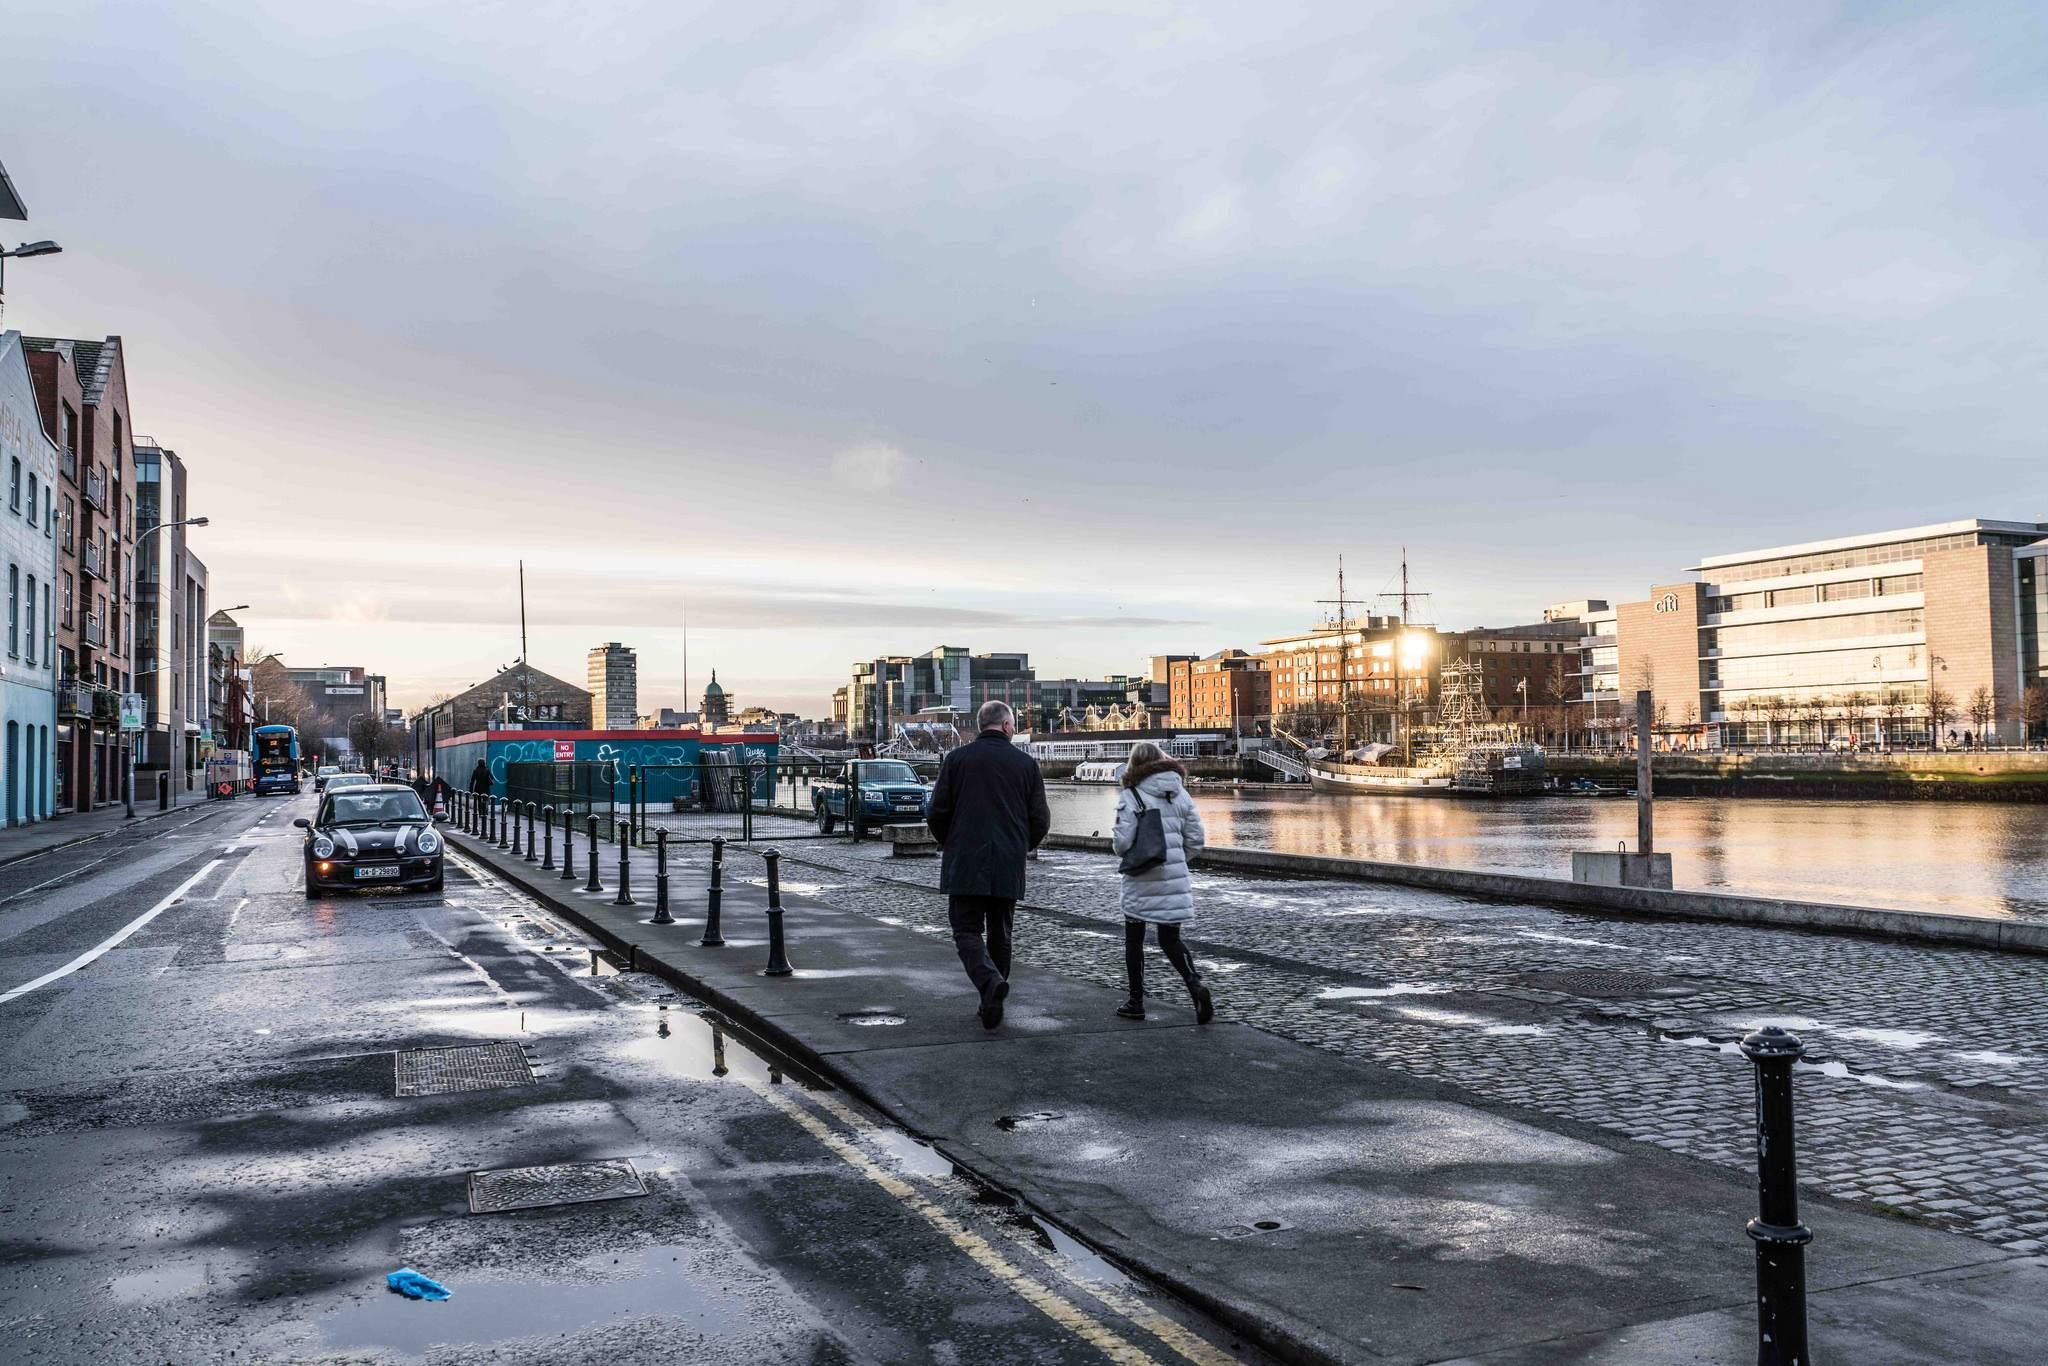 dublin docklands1 Walking Around Dublin Docklands by Marphy